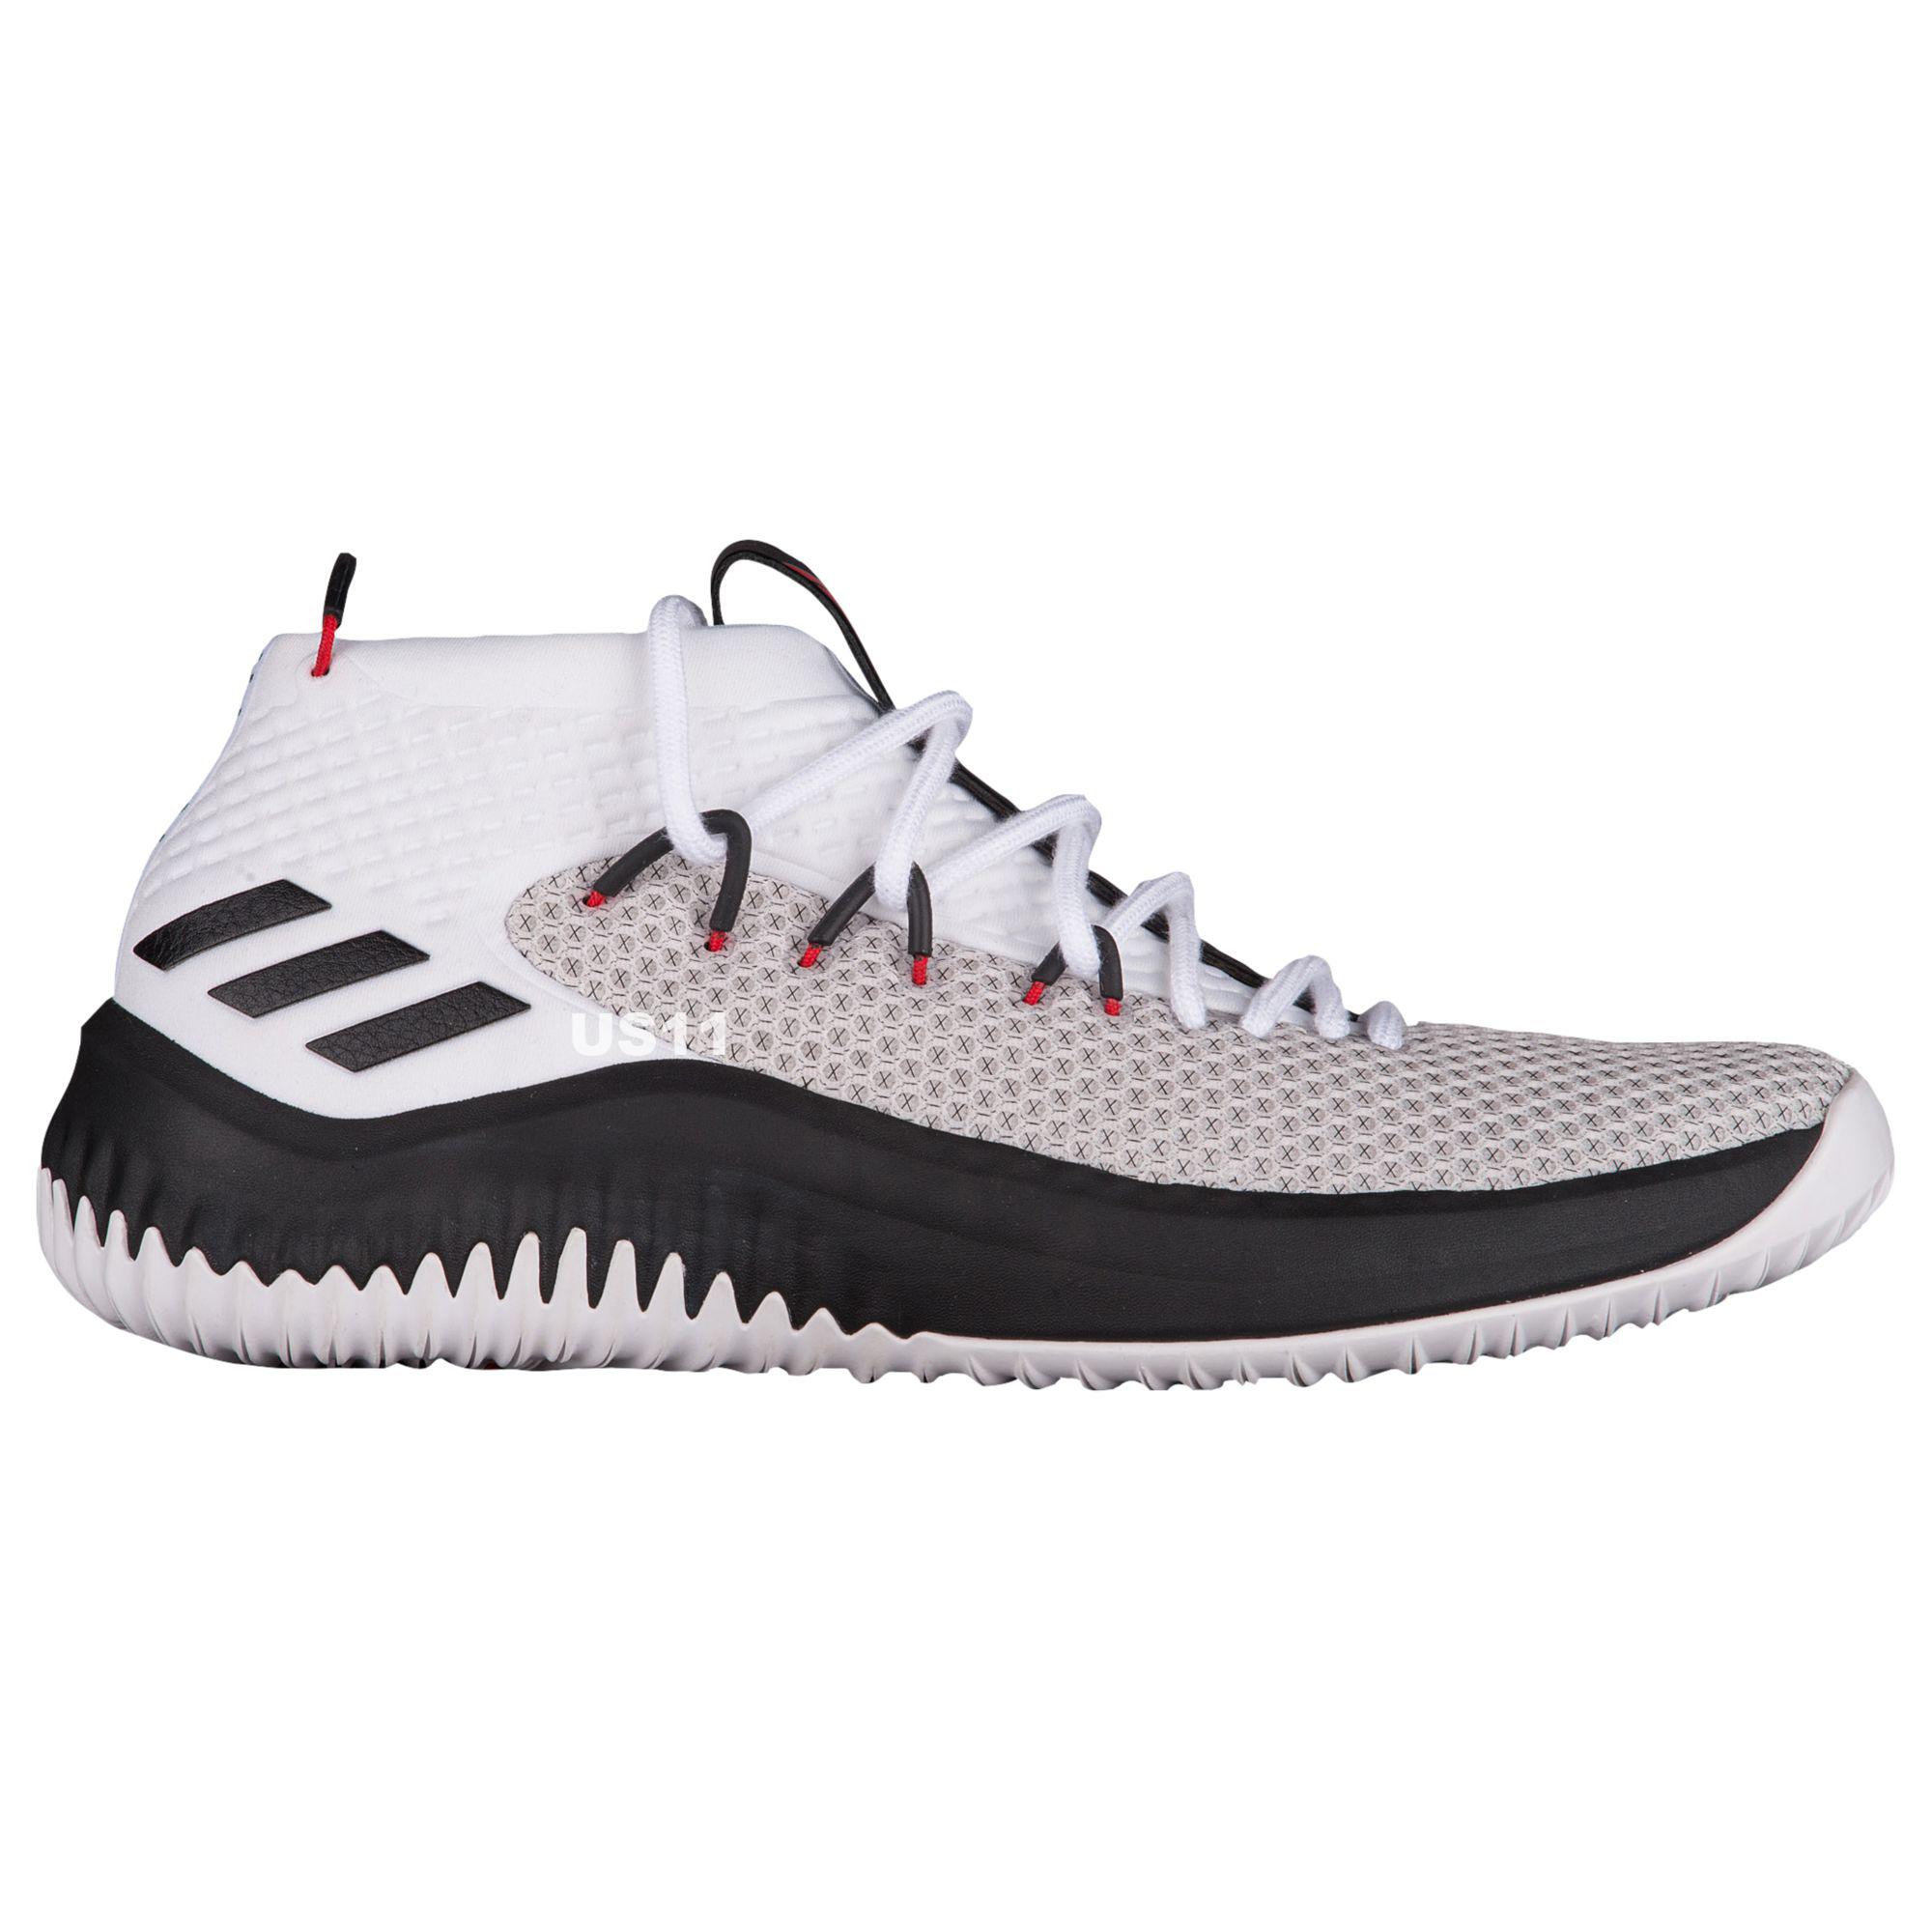 adidas dame 4 white black 1